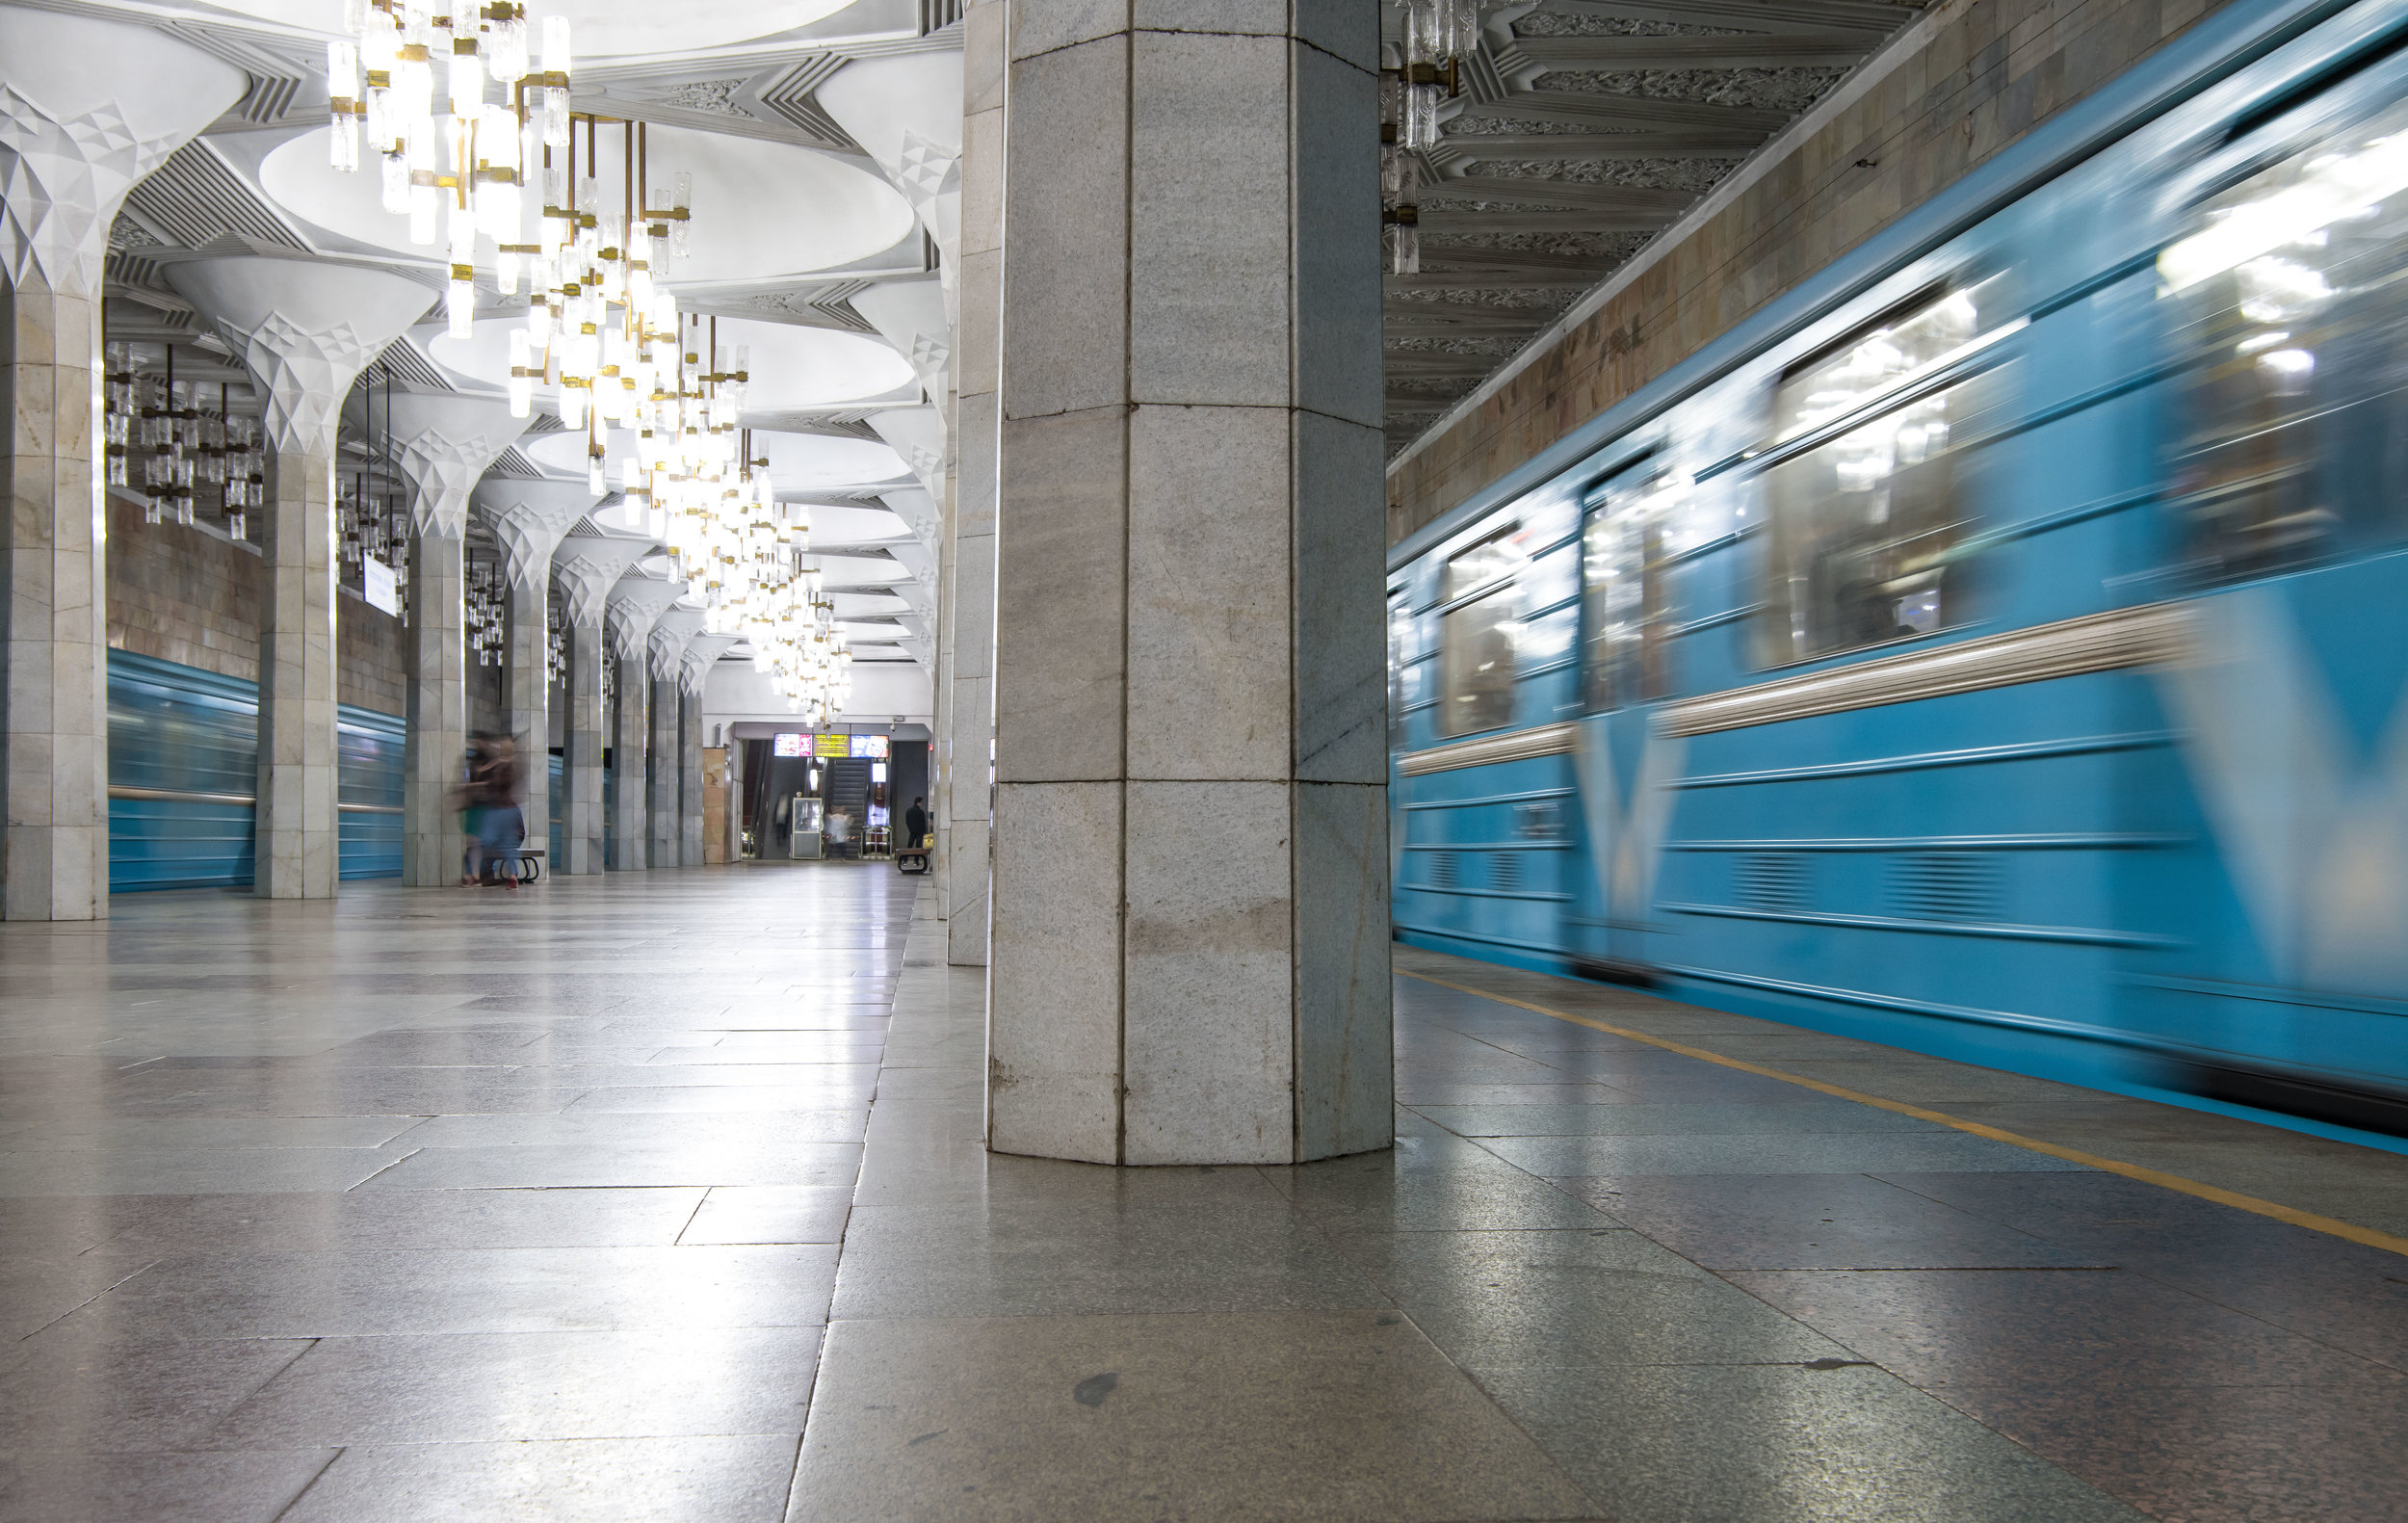 Tashkent-8927.jpg